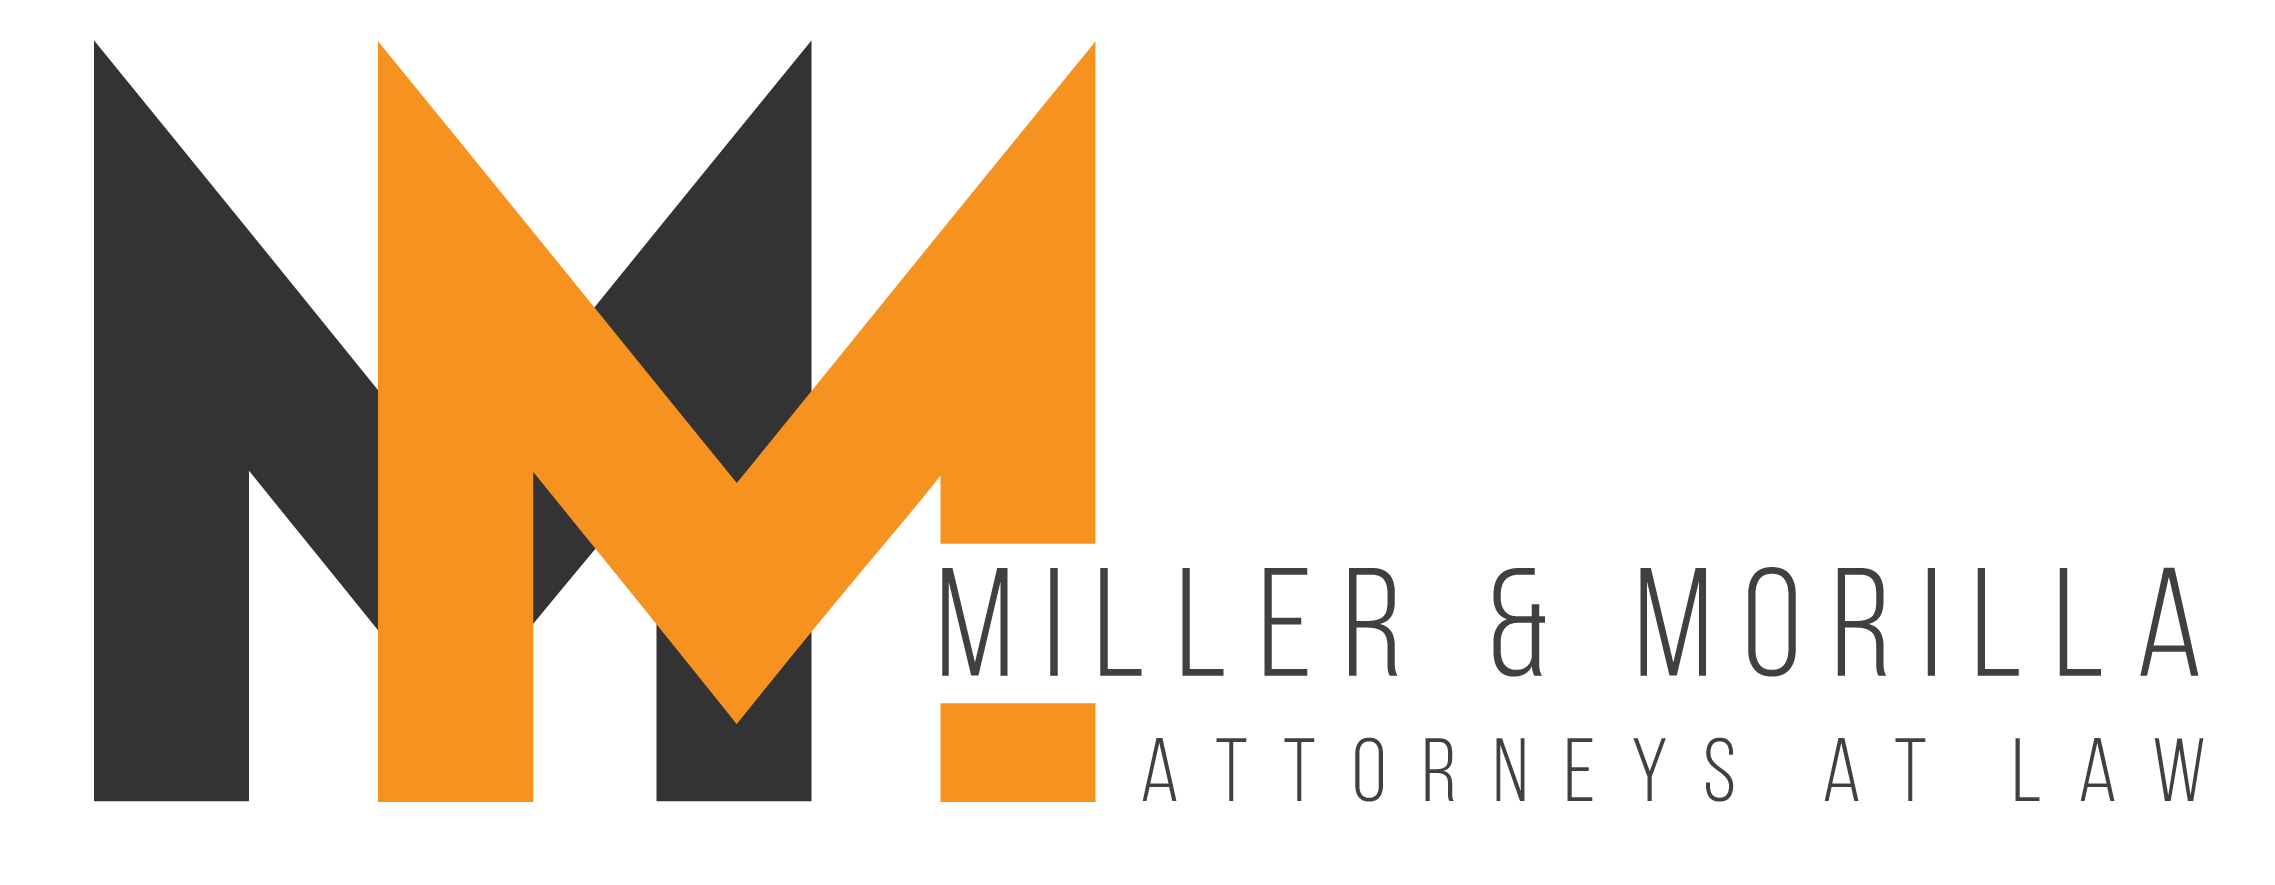 Miller & Morilla